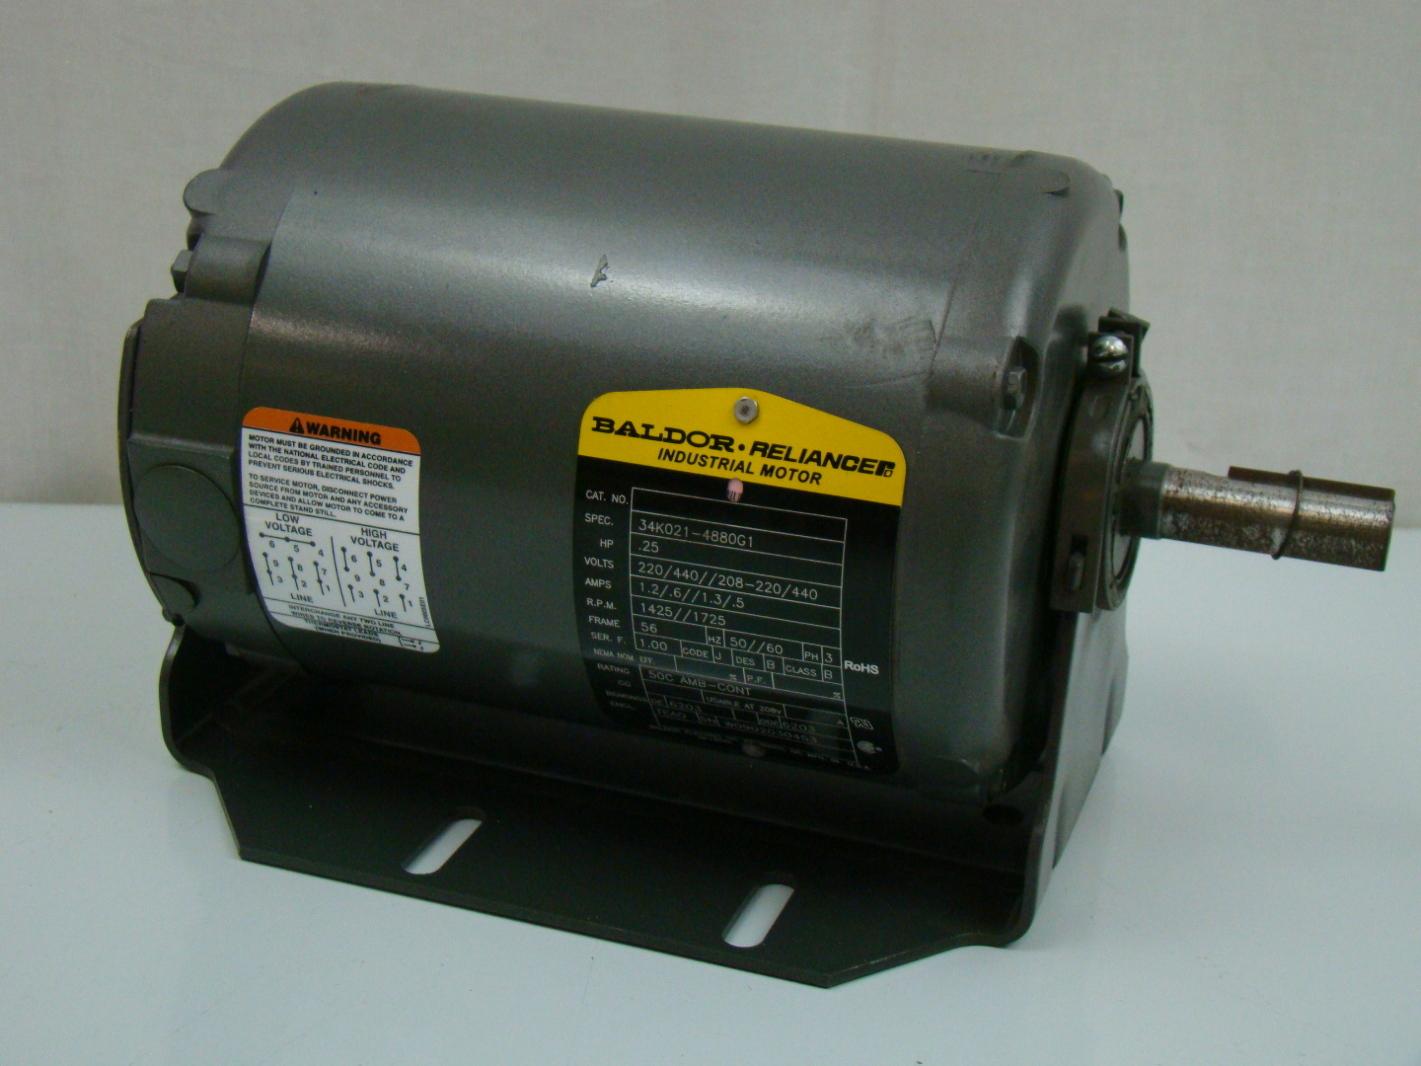 Baldor 1 4 Hp 3ph Electric Motor 34k021 4880g1 Ebay